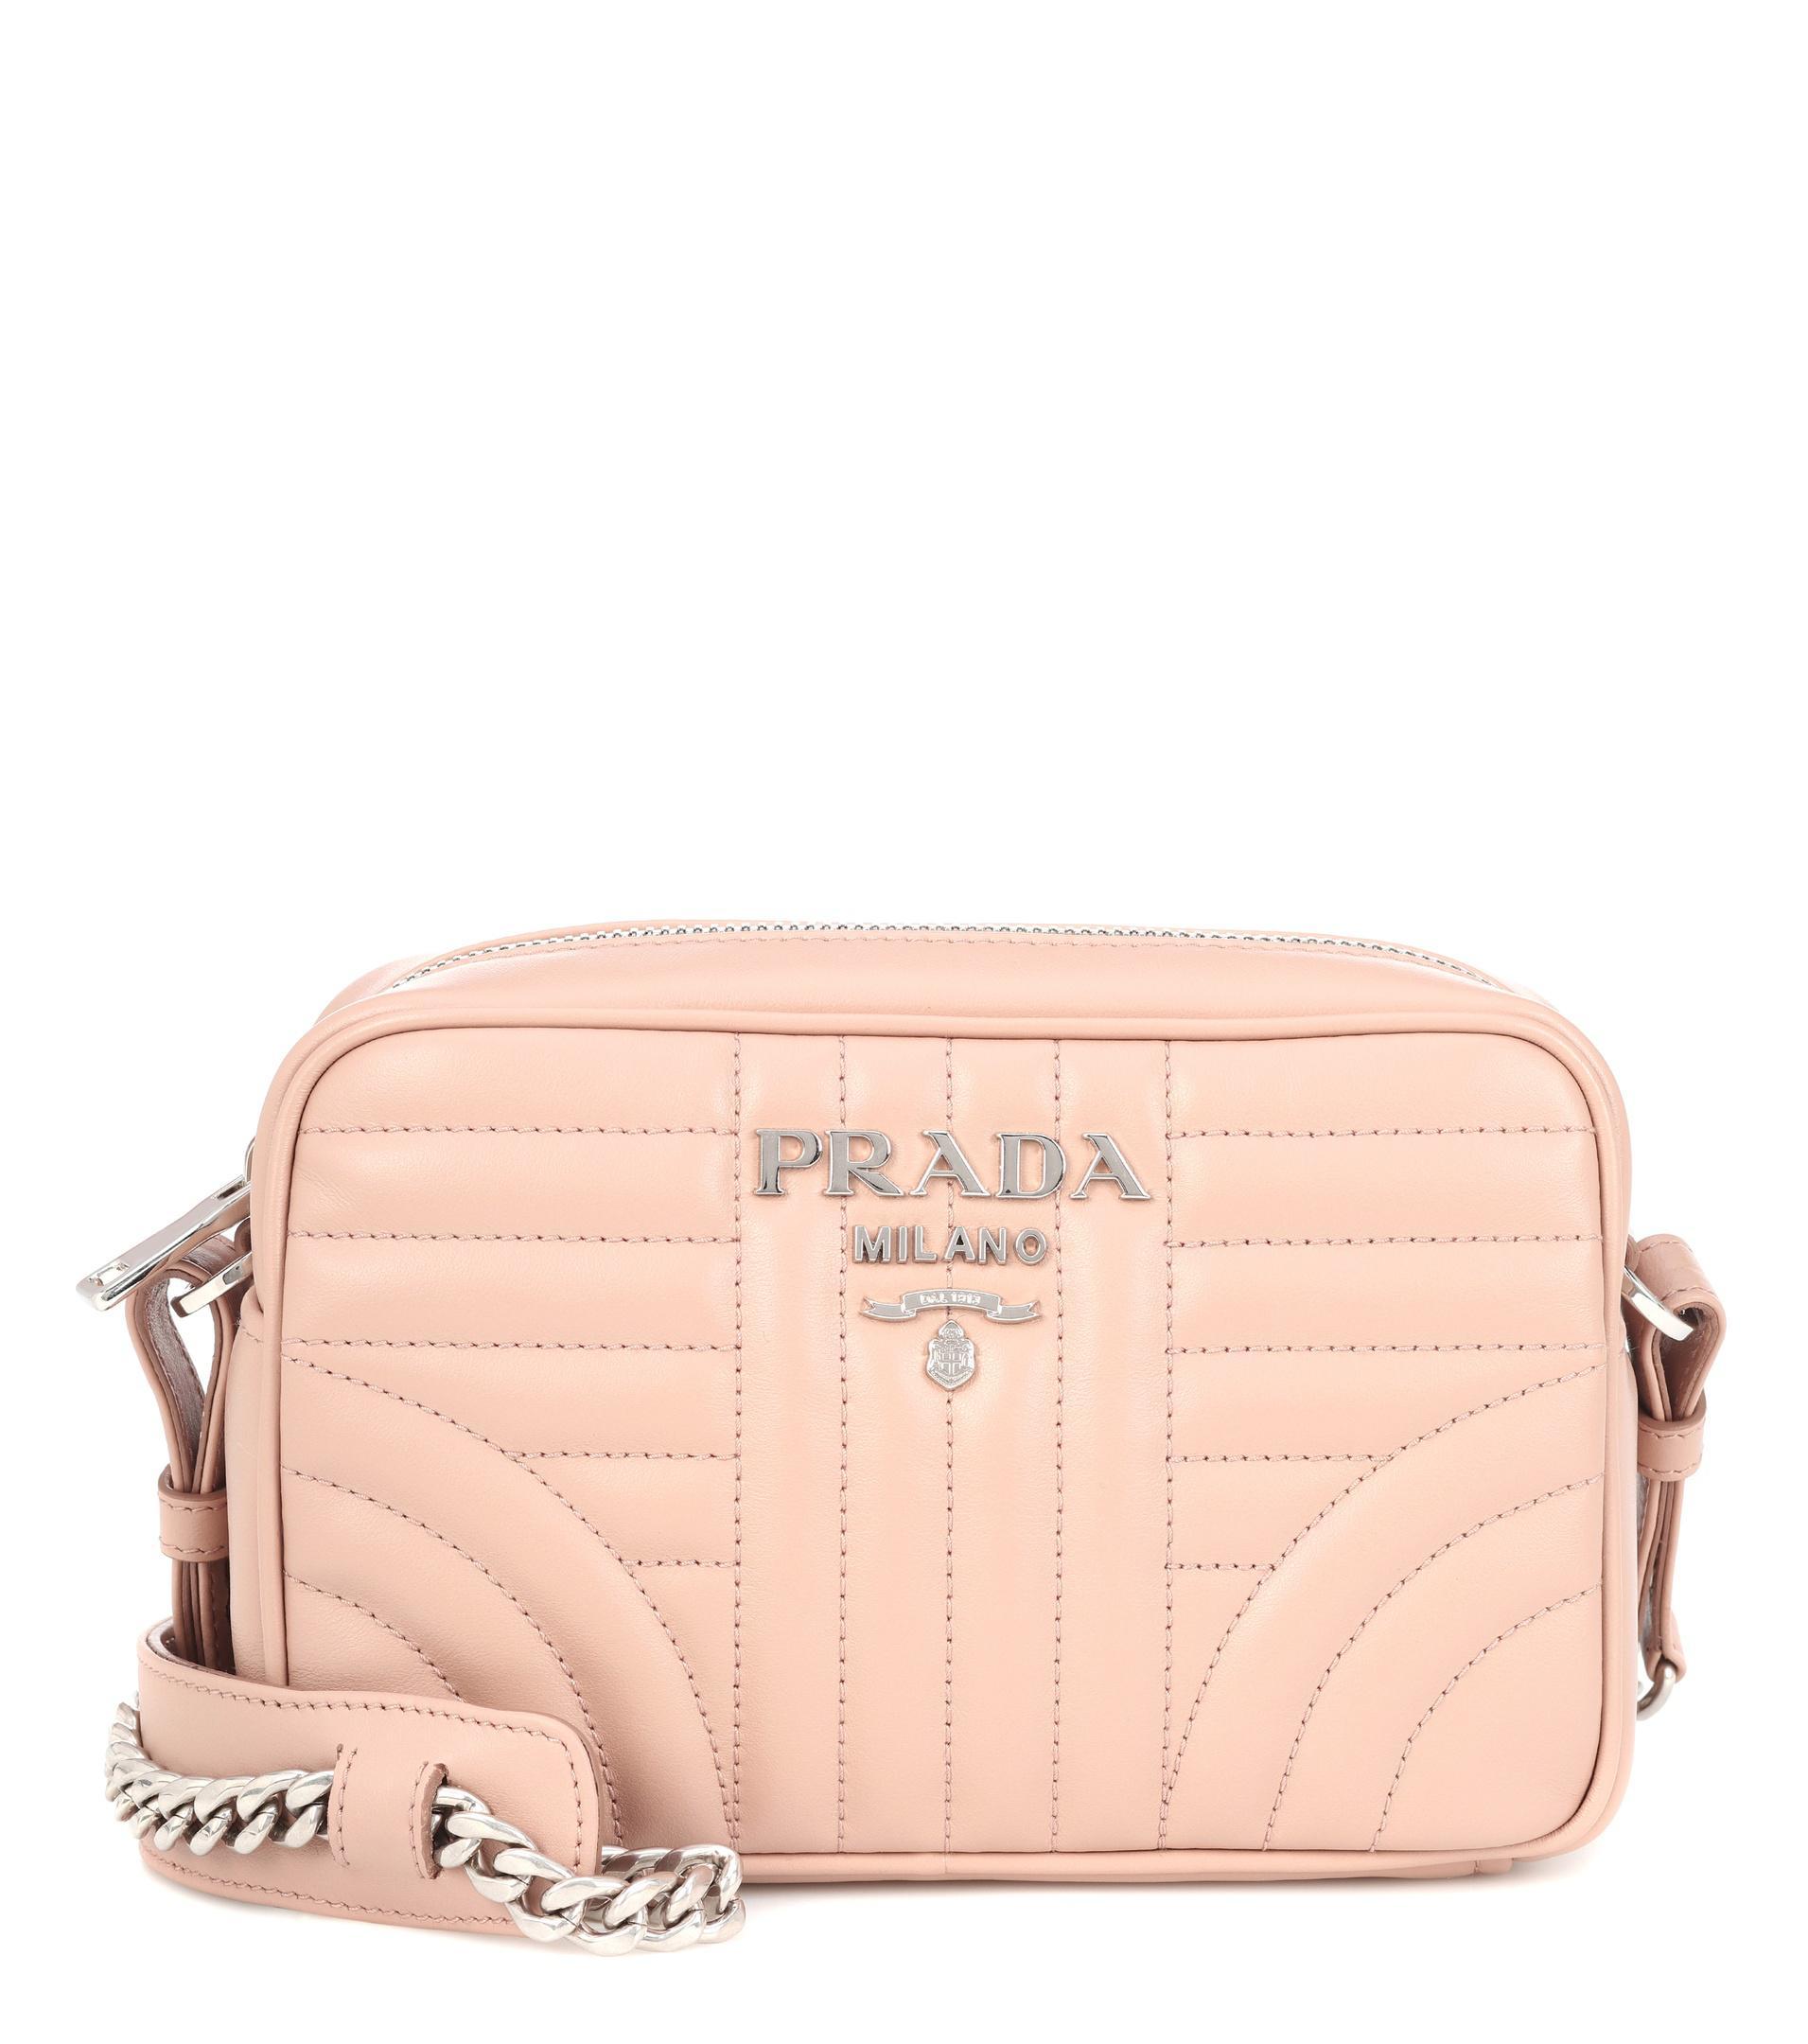 44fdbaa15728 Prada Diagramme Leather Shoulder Bag in Natural - Lyst